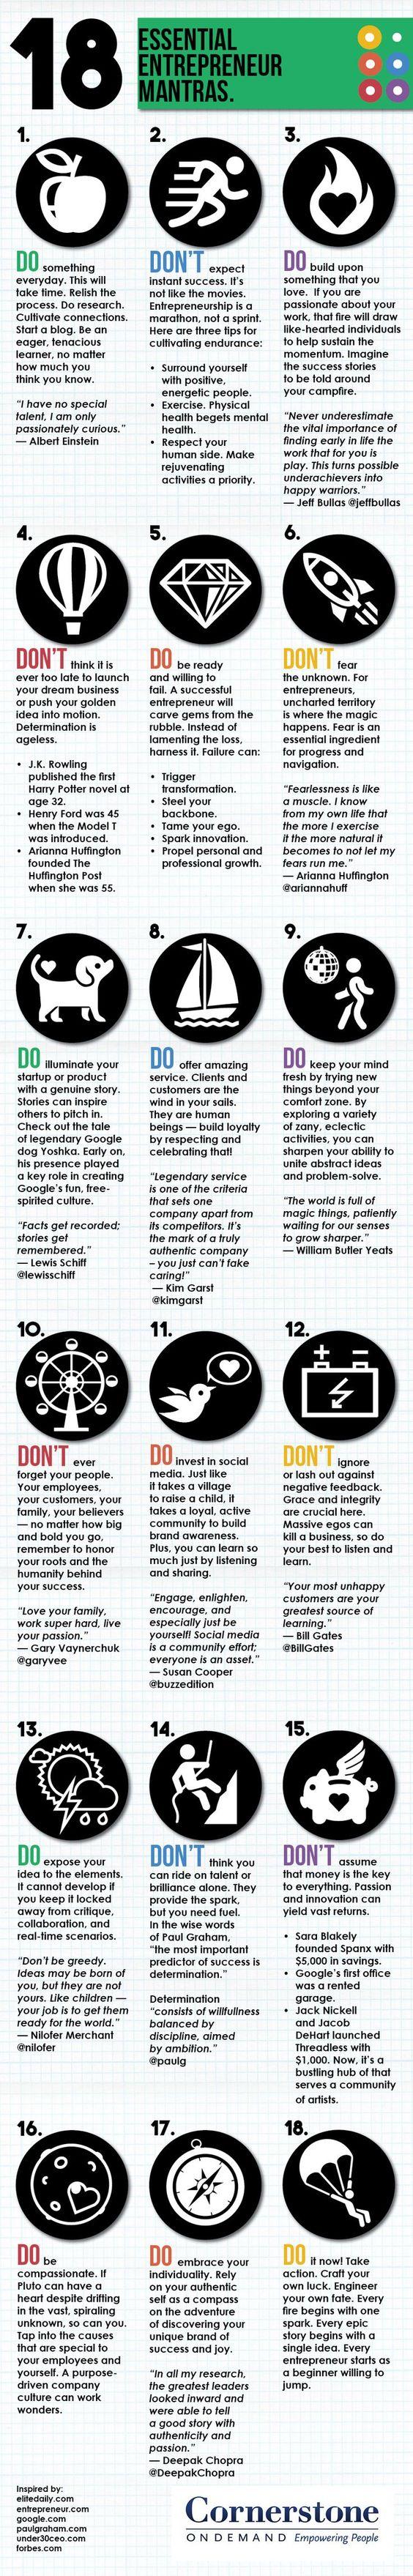 18 Essential Entrepreneur Mantras #infographic #Business #Entrepreneur